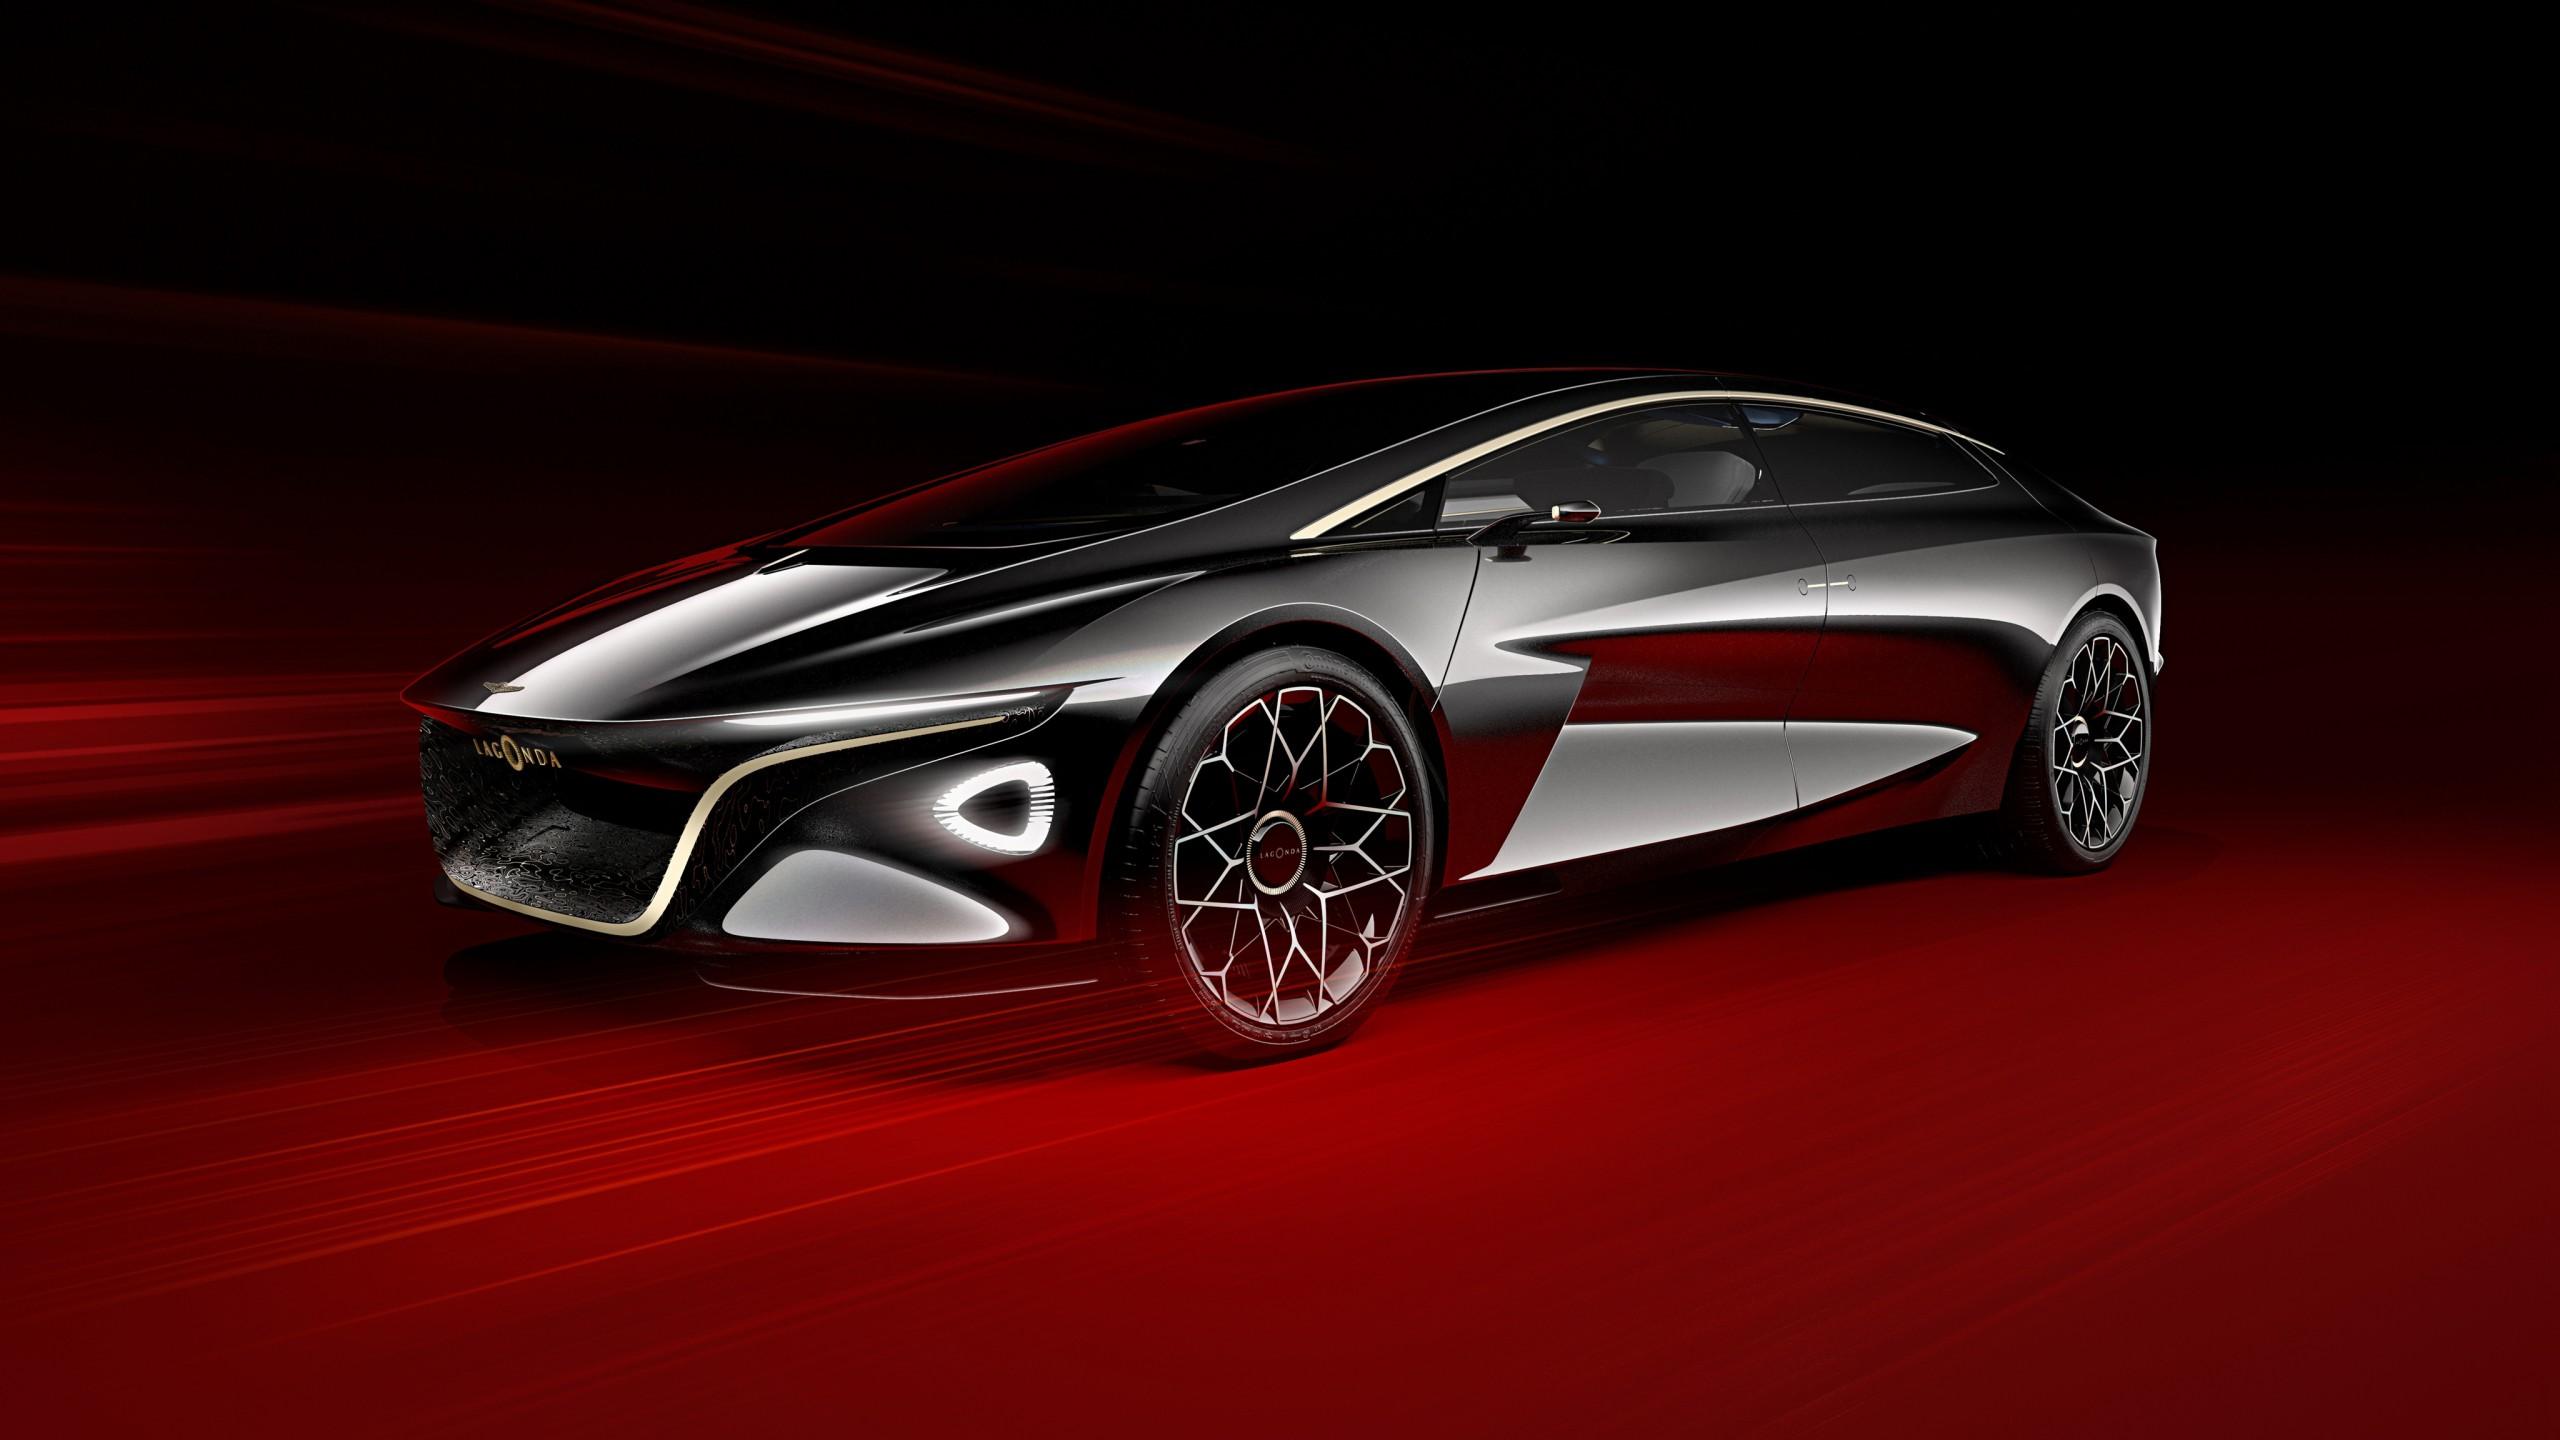 Car Wallpapers 4k Bentely 2018 Aston Martin Lagonda Vision Concept 4k 3 Wallpaper